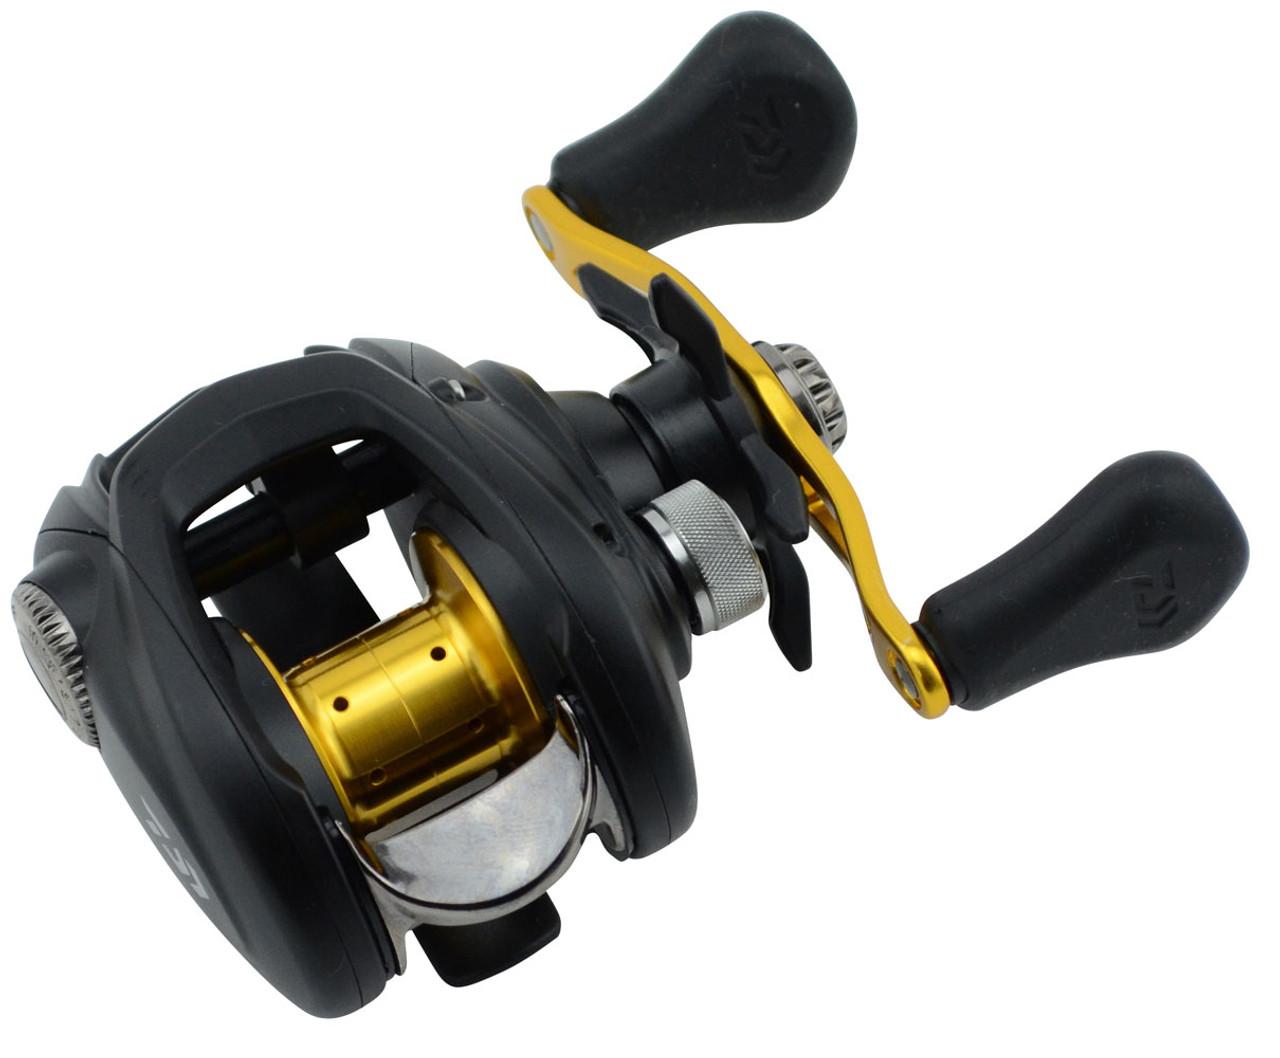 ff5d47e2b42 Daiwa Laguna Baitcaster Fishing Reel For Sale | Fishing Tackle Shop